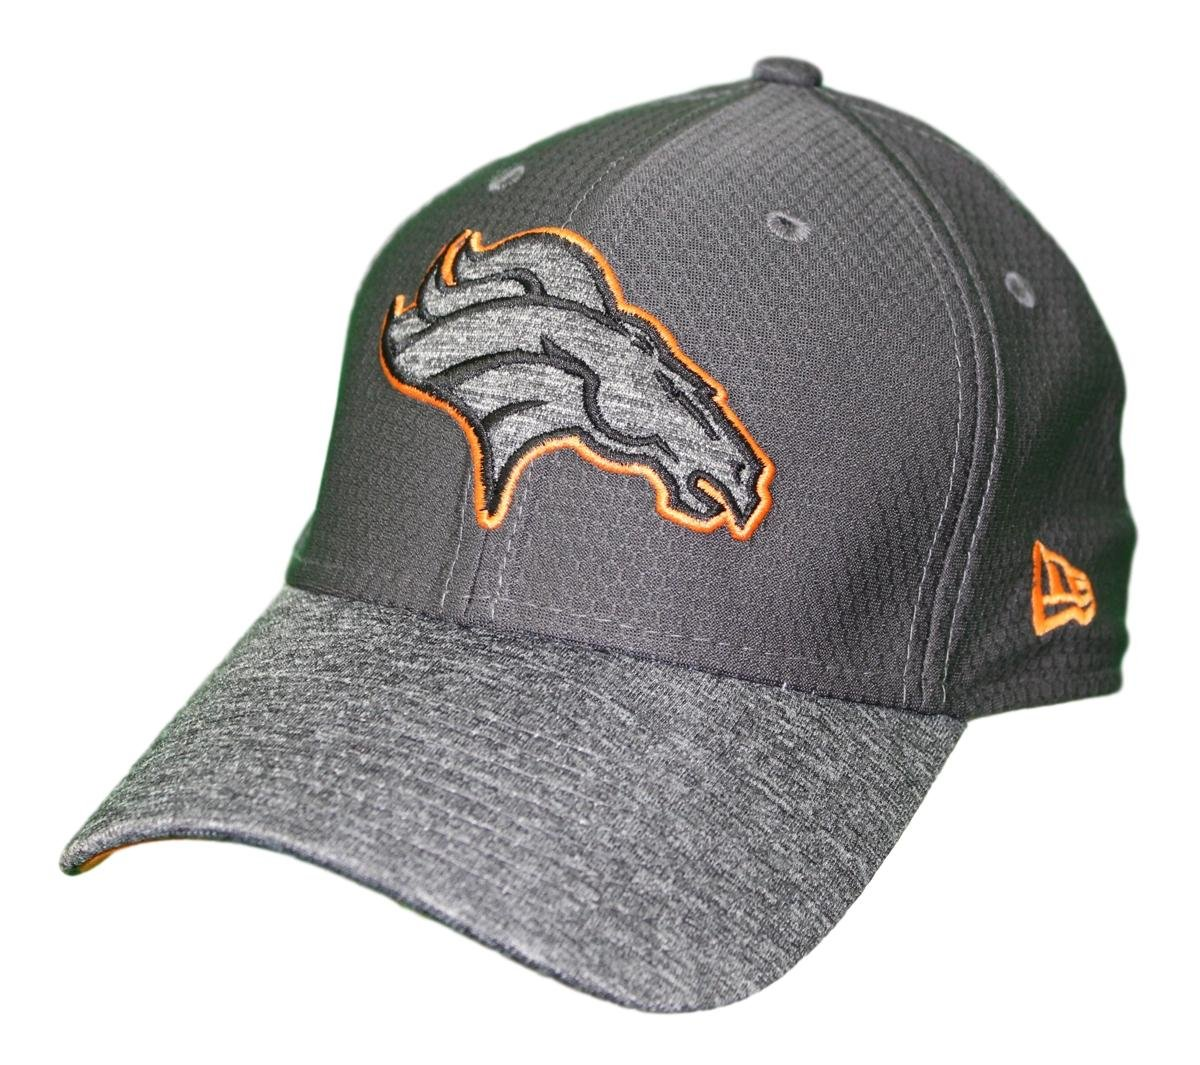 info for 0b1e2 f8aae Amazon.com   New Era Denver Broncos NFL 39THIRTY Popped Shadow Flex Fit Hat  - Graphite   Clothing